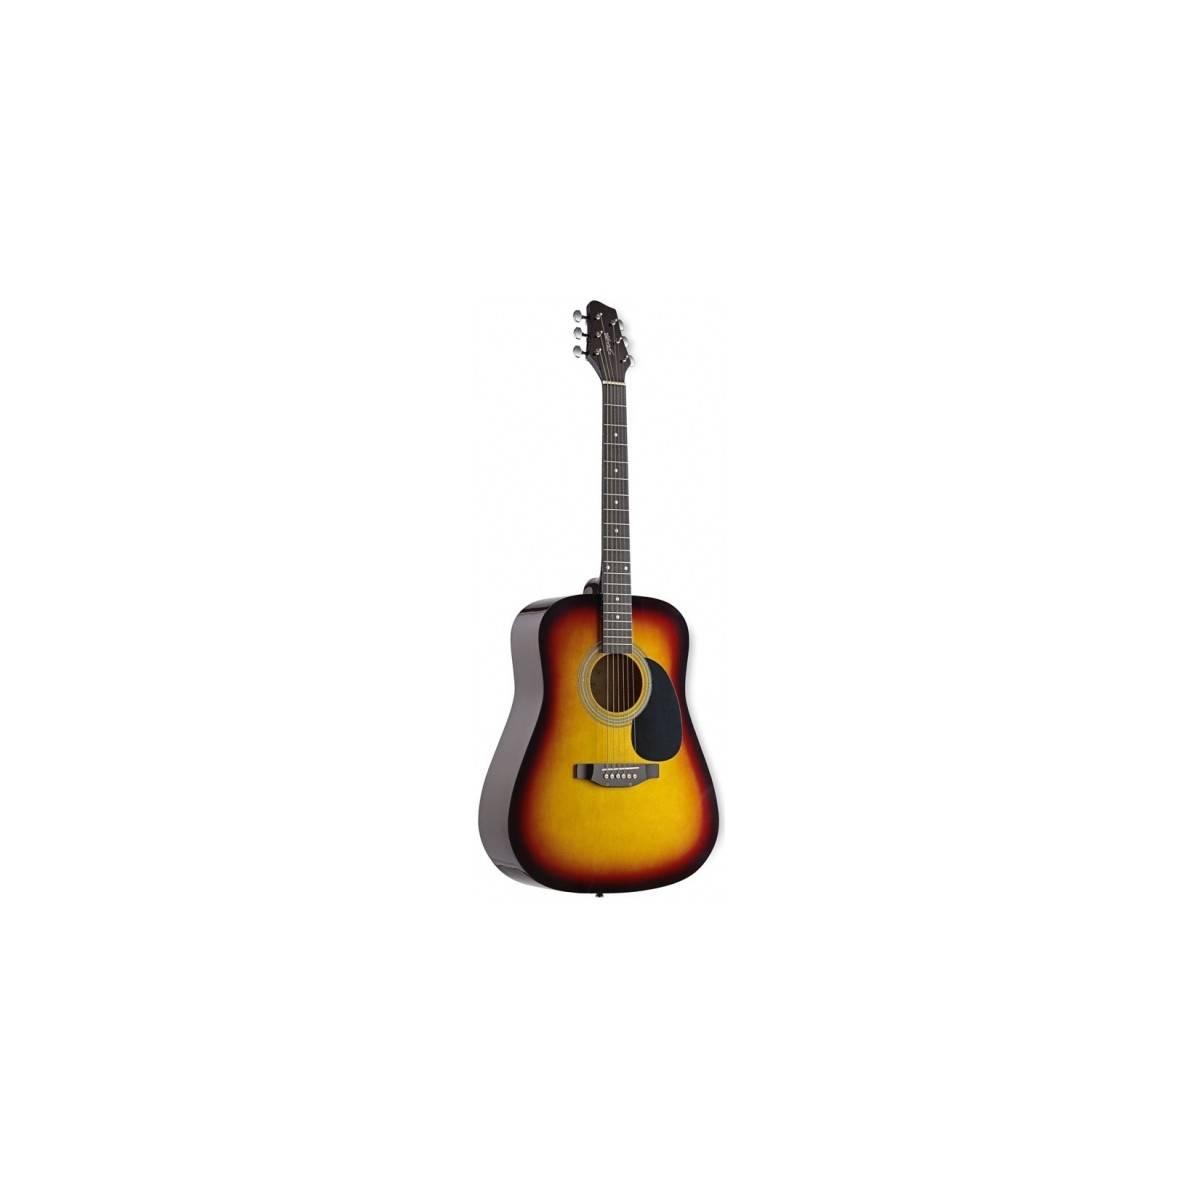 guitare folk 4 4 d butant guitare acoustique sunburst. Black Bedroom Furniture Sets. Home Design Ideas